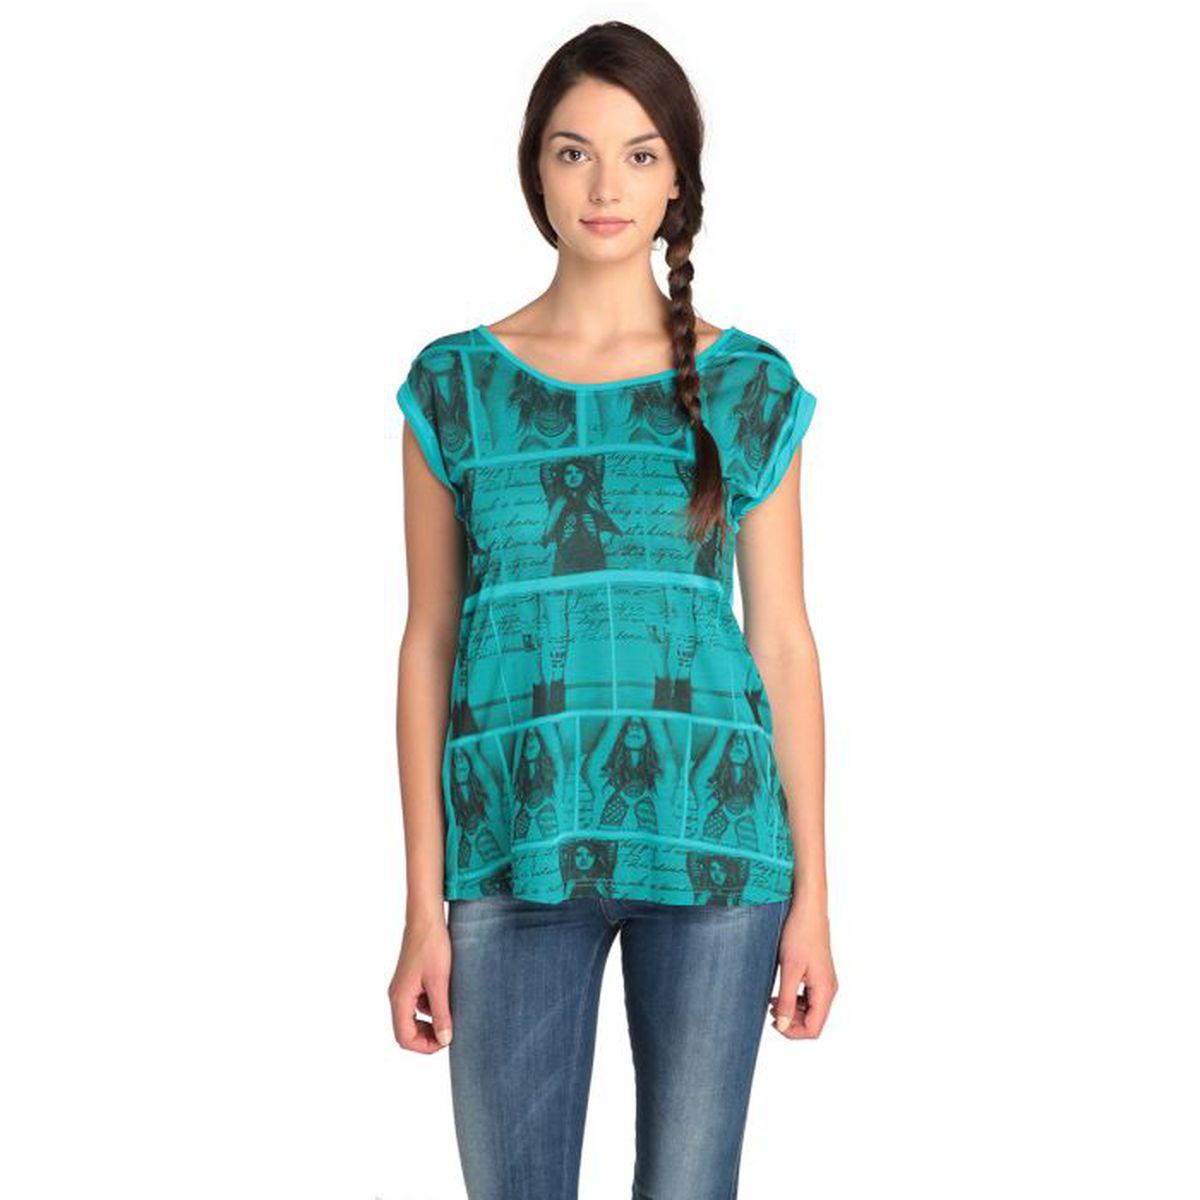 Cdiscount Girl Turquoise Femme Tribu Achat T Shirt Vente rdxeQCBoW